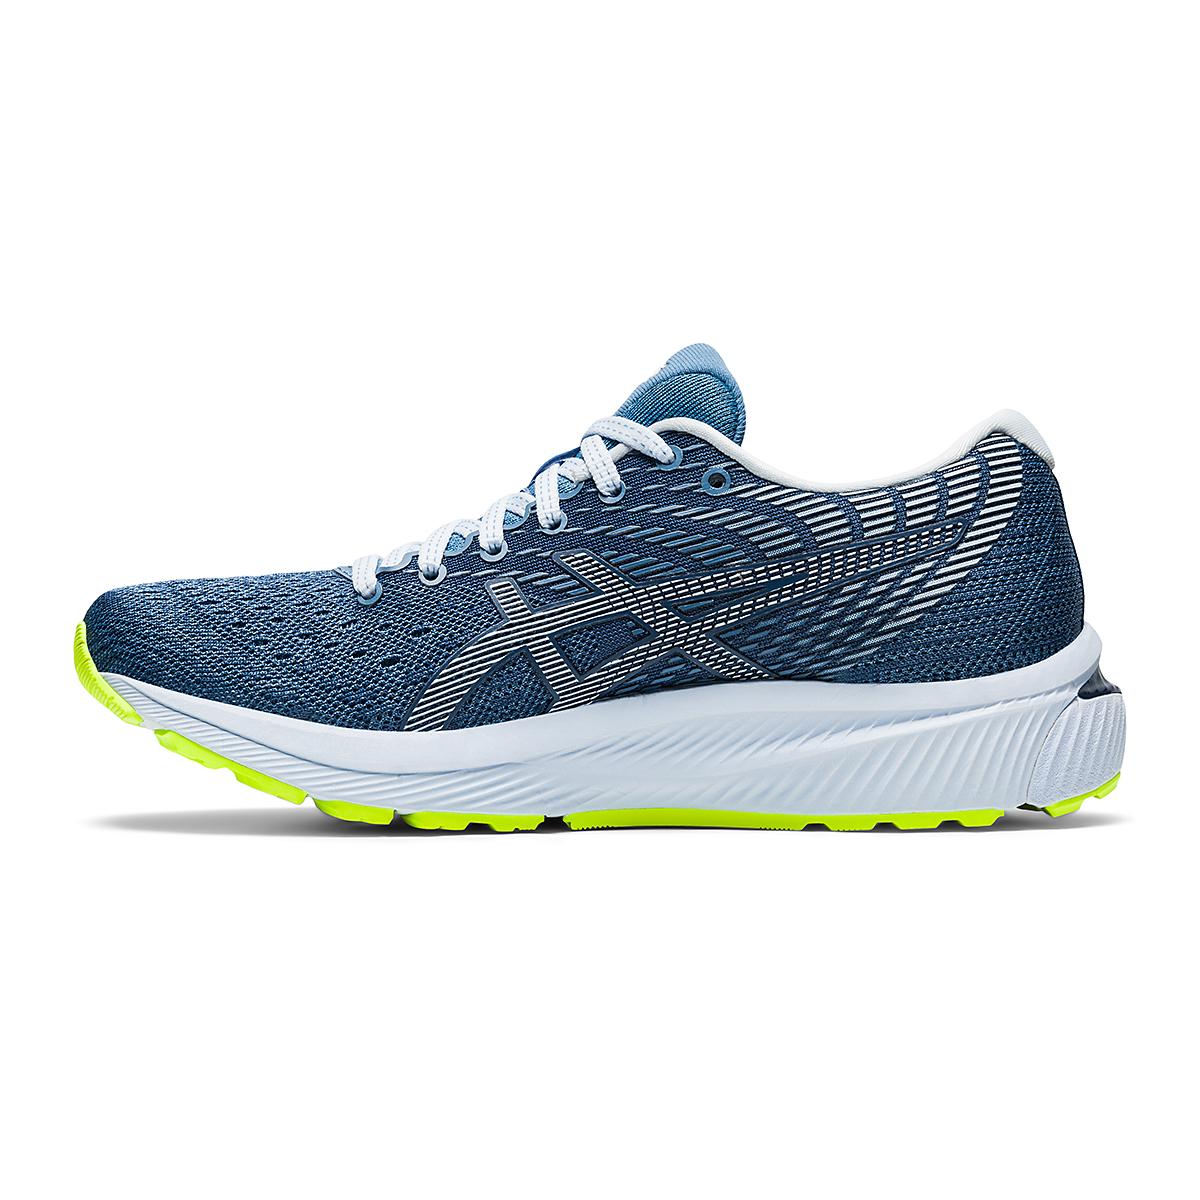 Women's Asics GEL-Cumulus 22 Running Shoe - Color: Grey Floss/White - Size: 6 - Width: Regular, Grey Floss/White, large, image 2